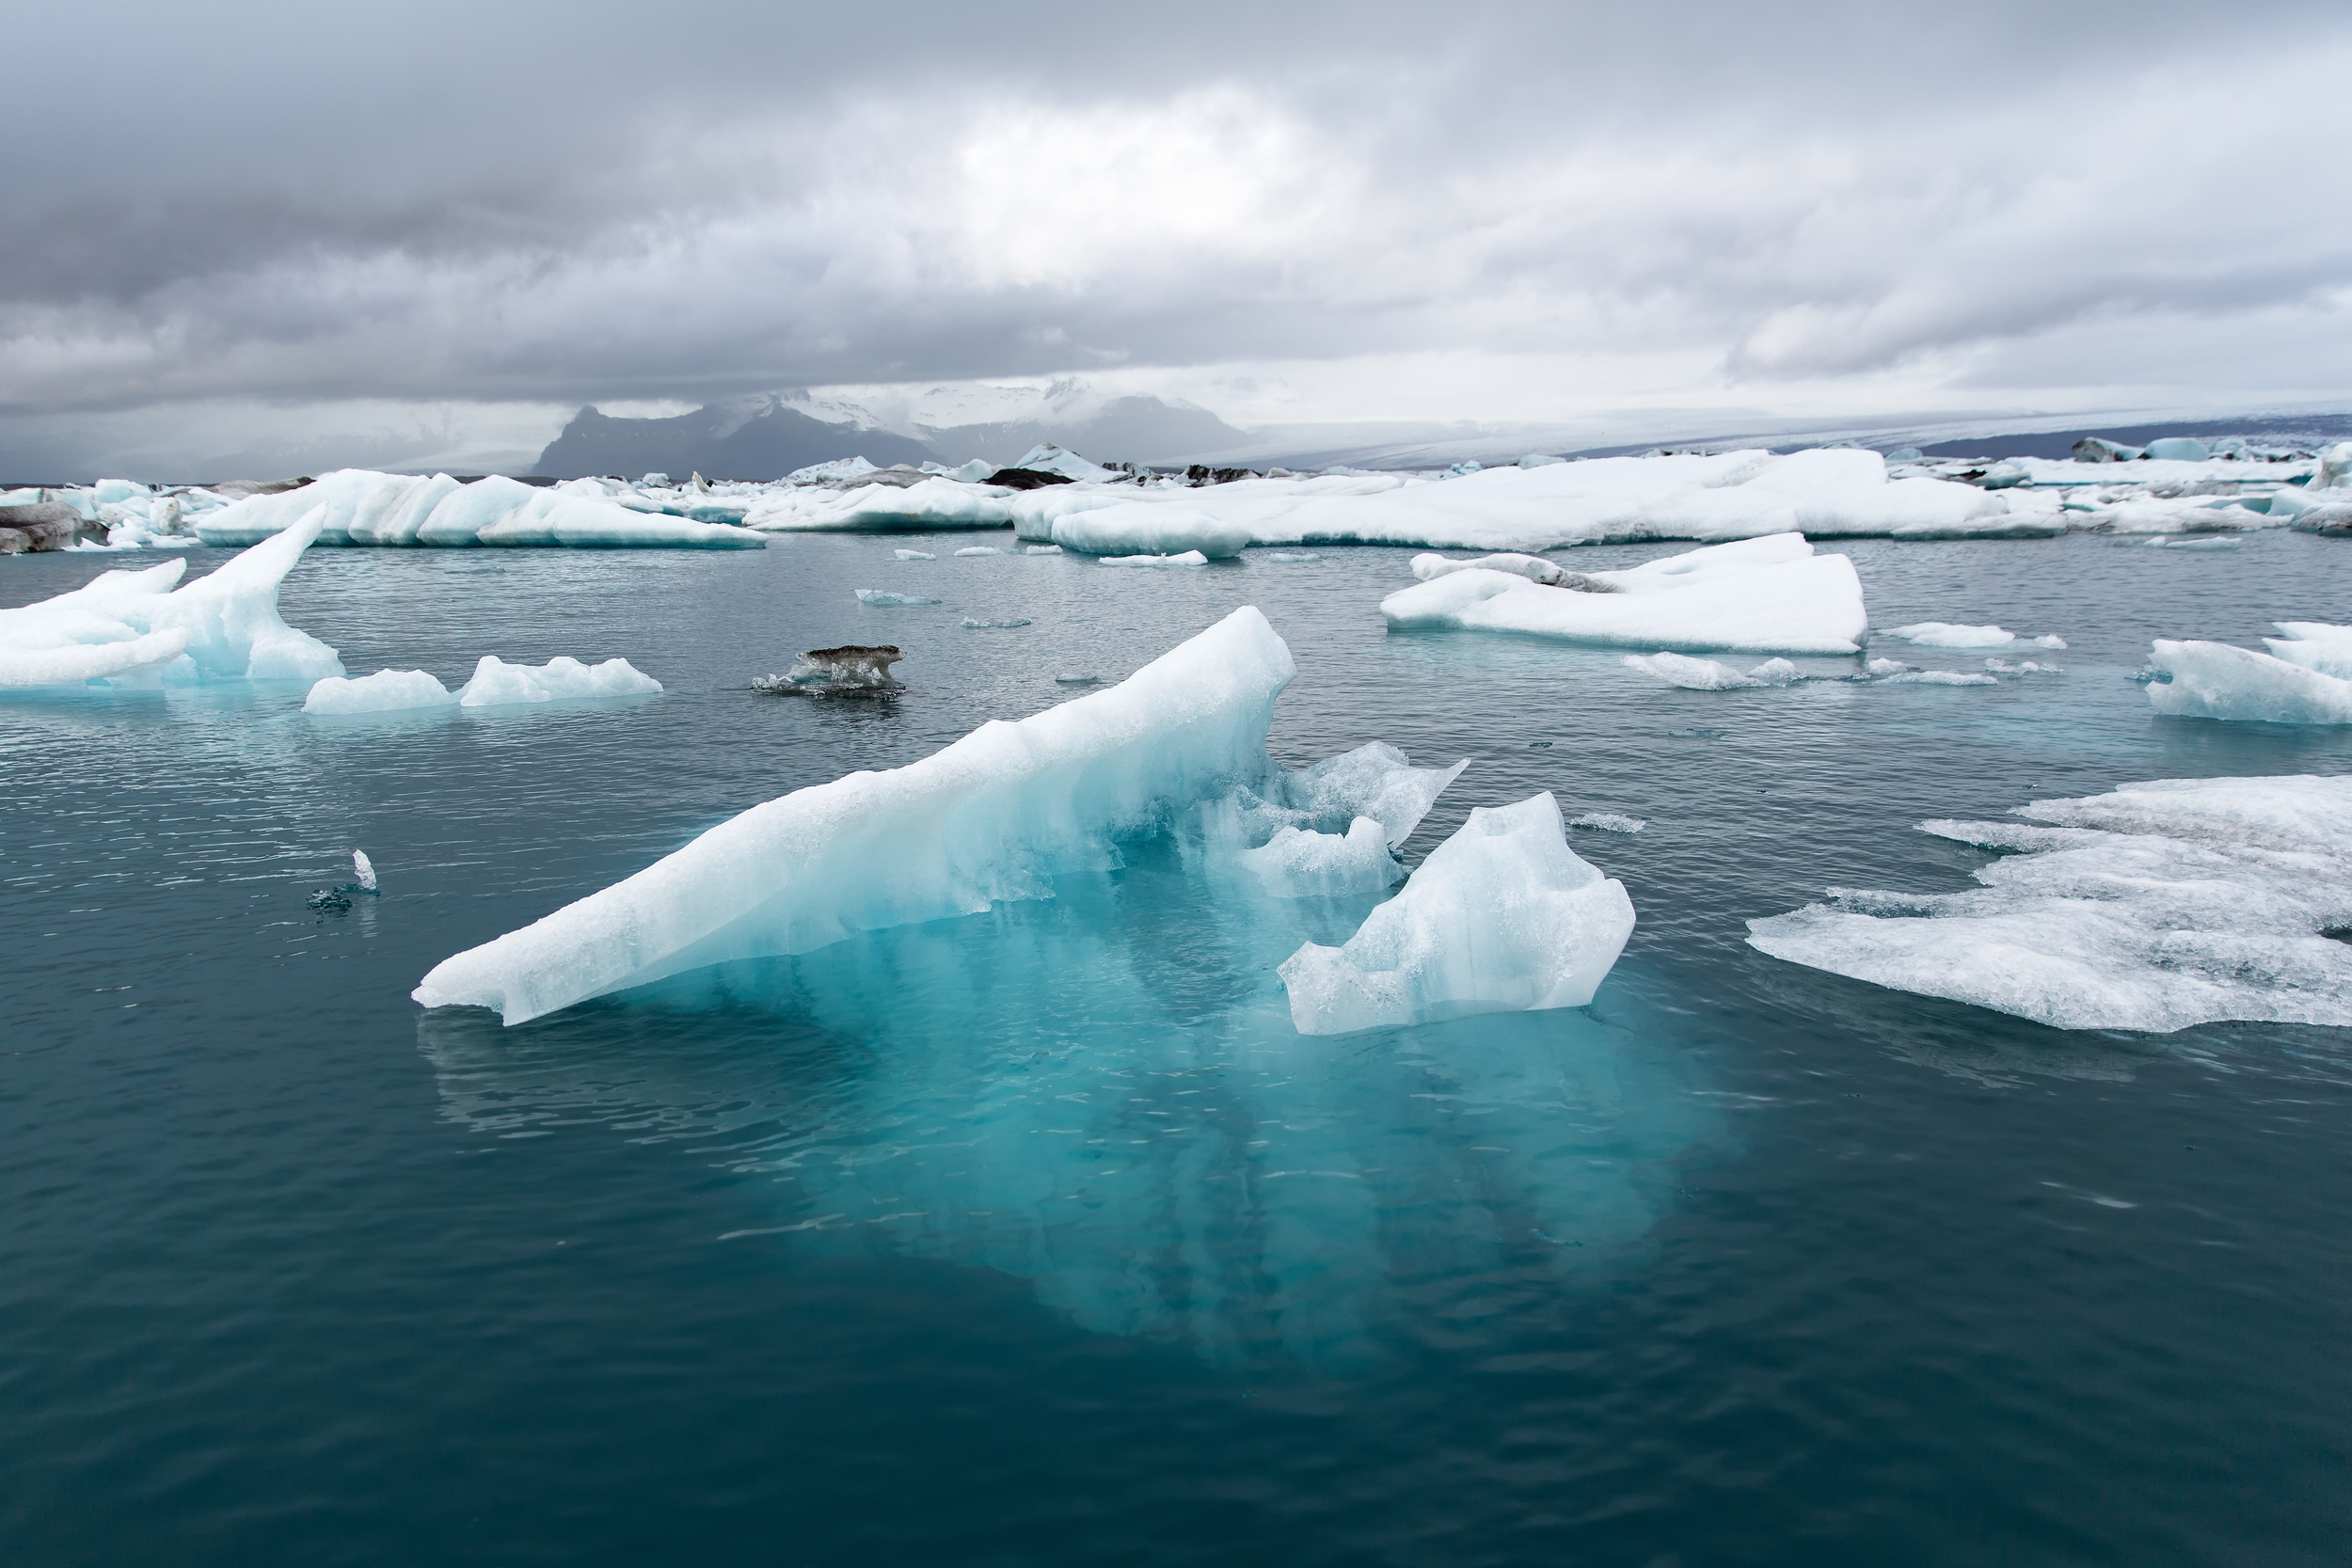 Jokulsarlon Glacier Lagoon (South Coast, Iceland).